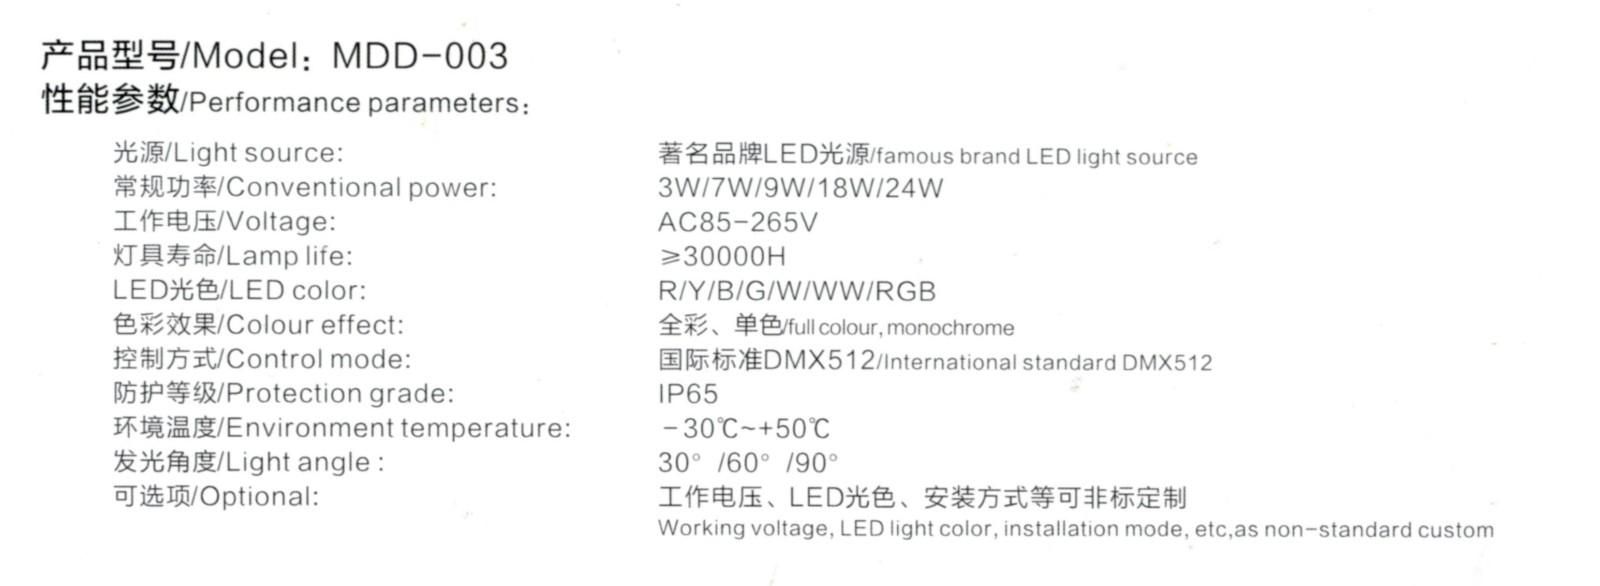 LED埋地灯Model∶MDD-003参数.jpg